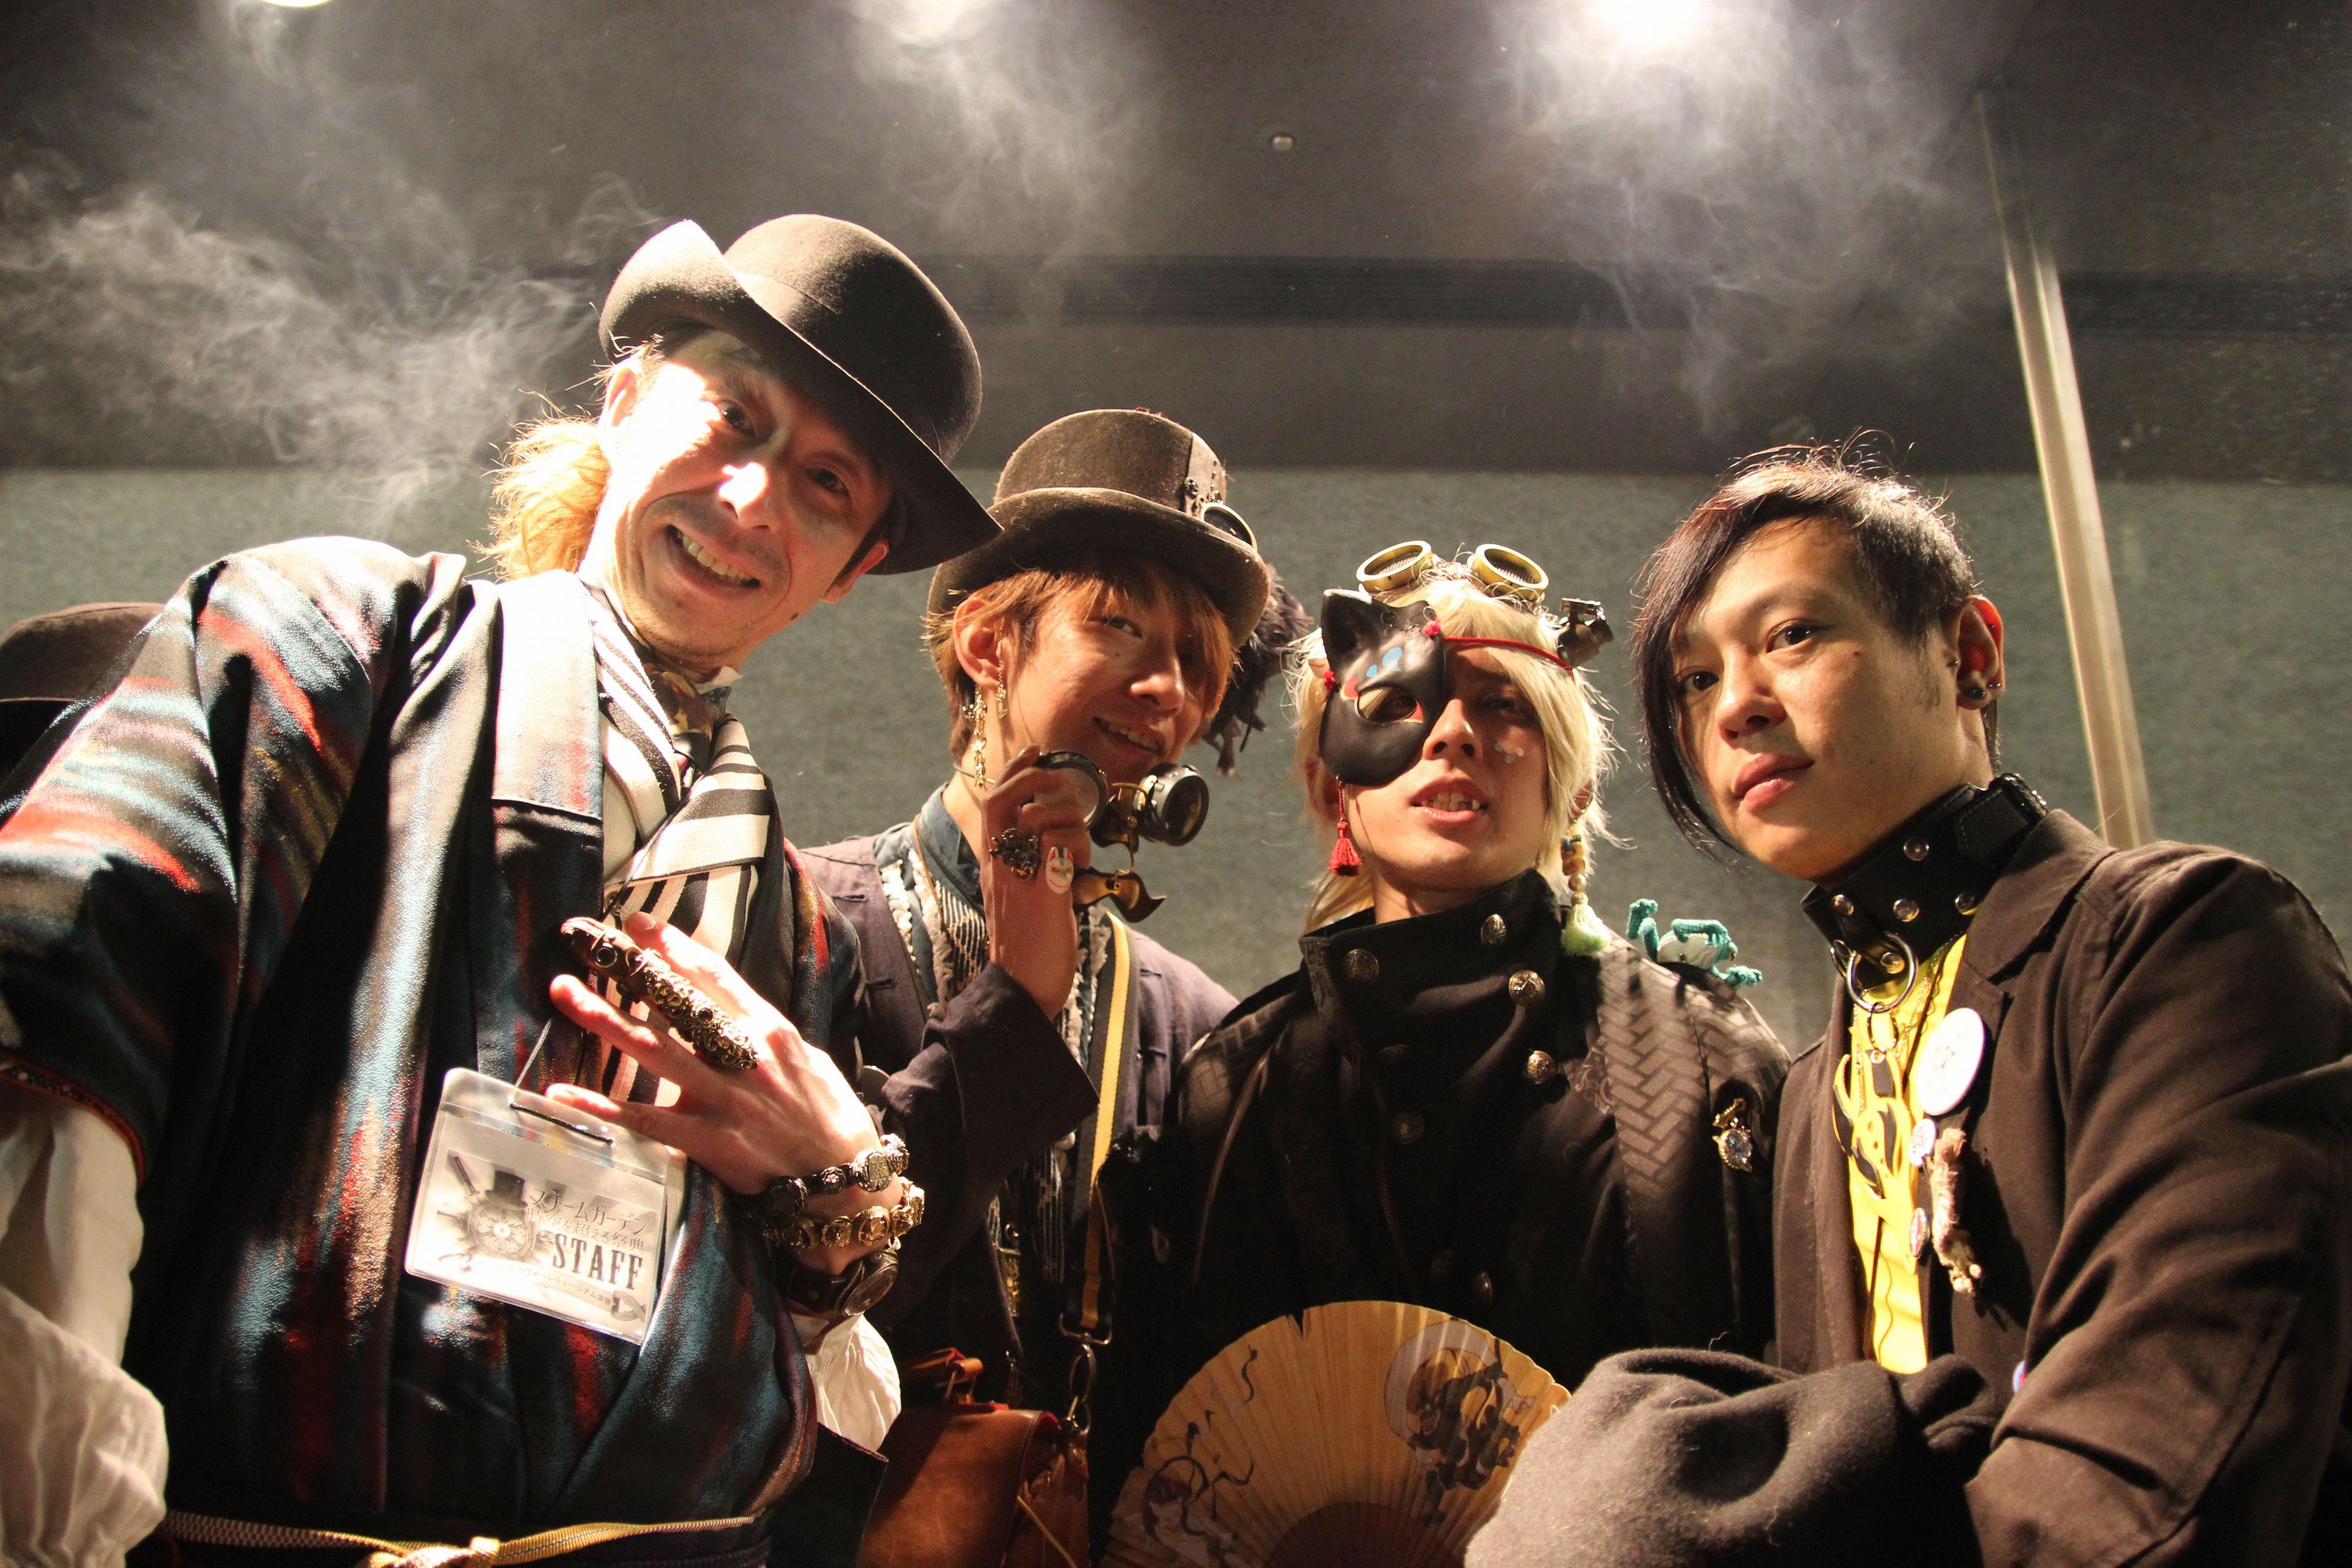 Steam Garden スチームガーデン8 @ ラフォーレ原宿~和~着物・ウサギ・狐・烏天狗・虚無僧・農民・花魁・風神&雷神~